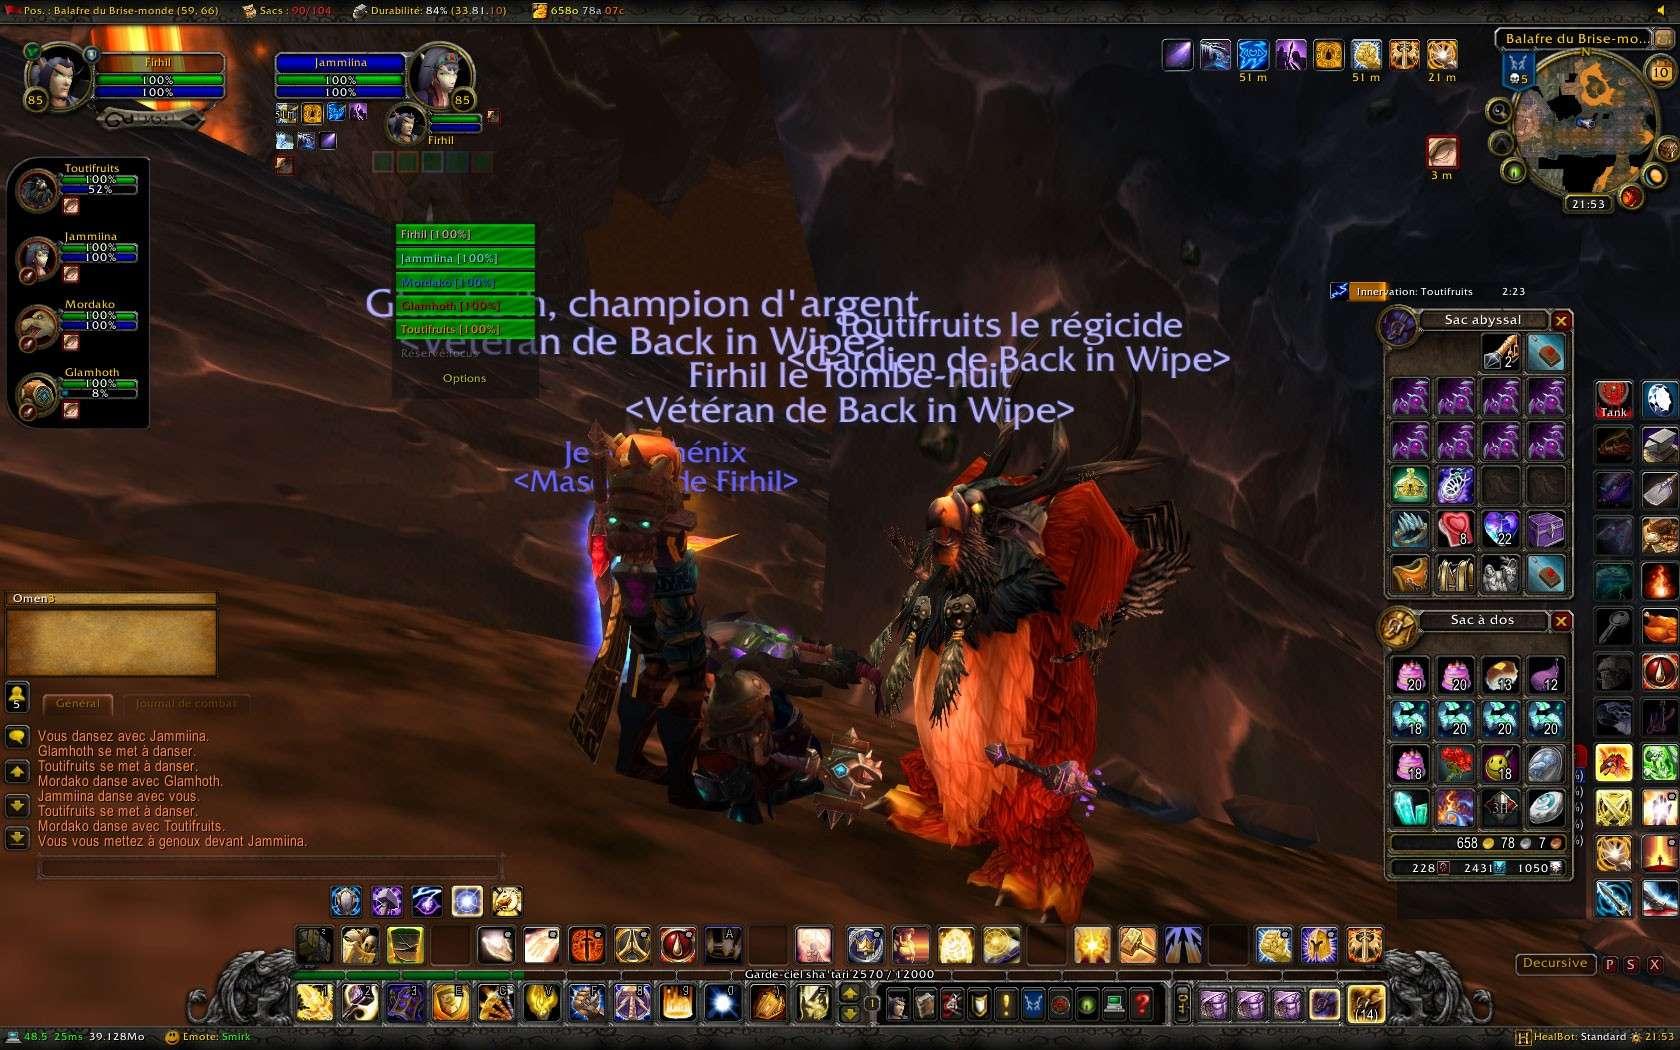 La vie dans la guilde Wowscr26